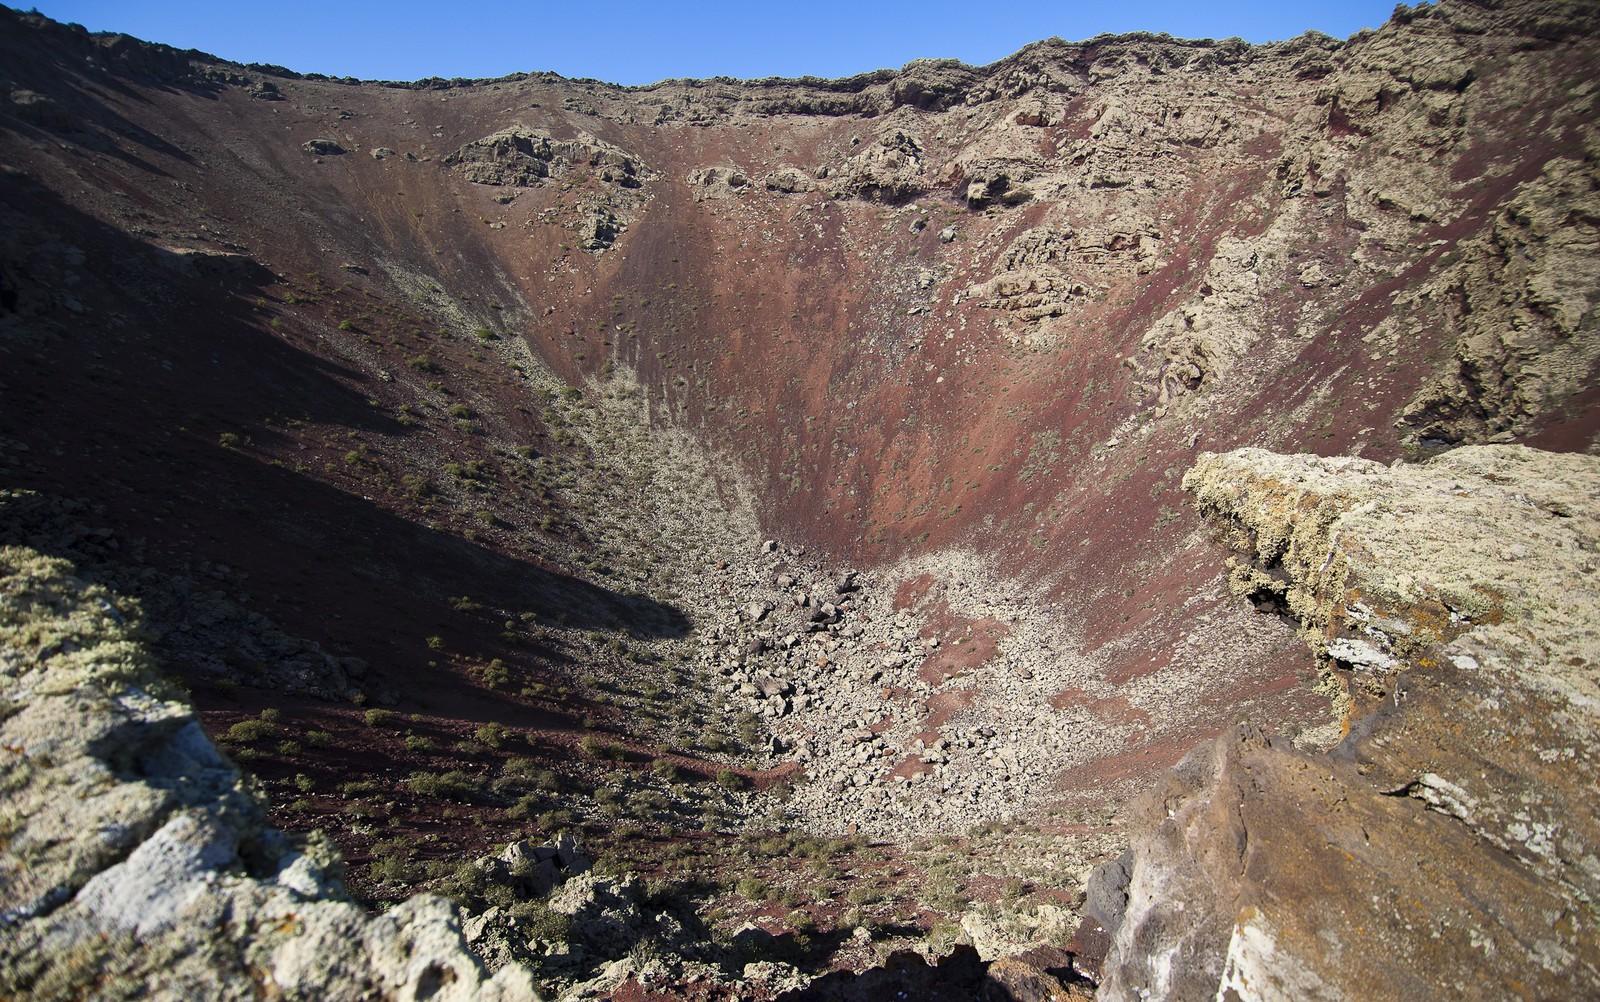 Cráter del volcán de la Corona, fotografía de Ramón Pérez Niz